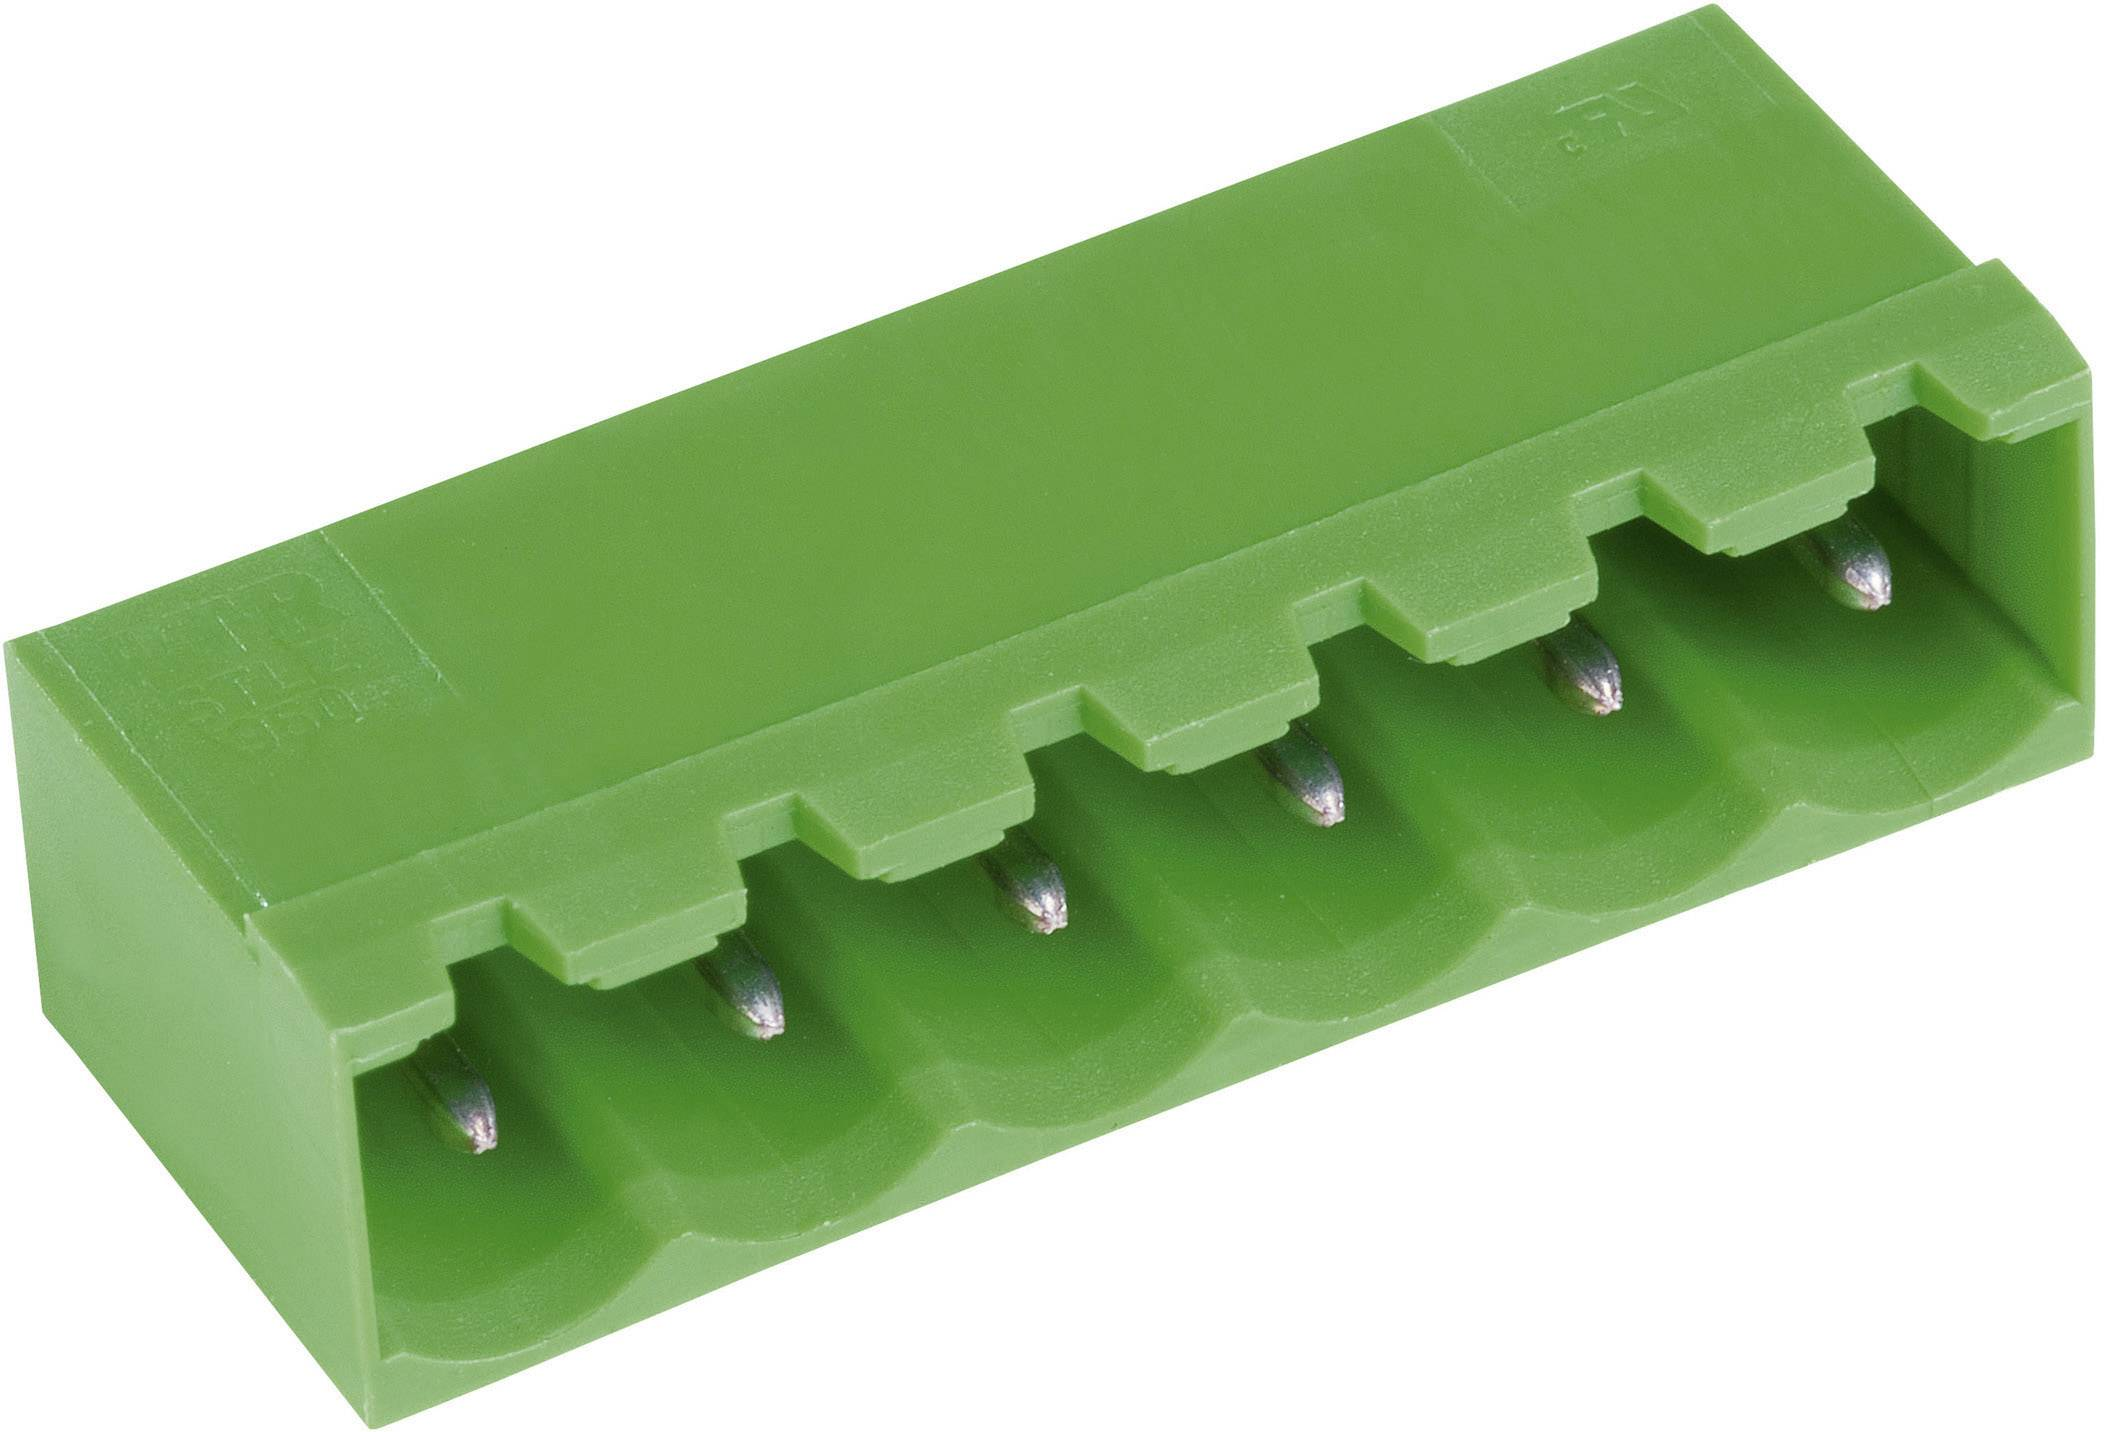 Konektor do DPS PTR STLZ950/7G-5.08-H 50950075021E, 36.76 mm, pólů 7, rozteč 5.08 mm, 1 ks